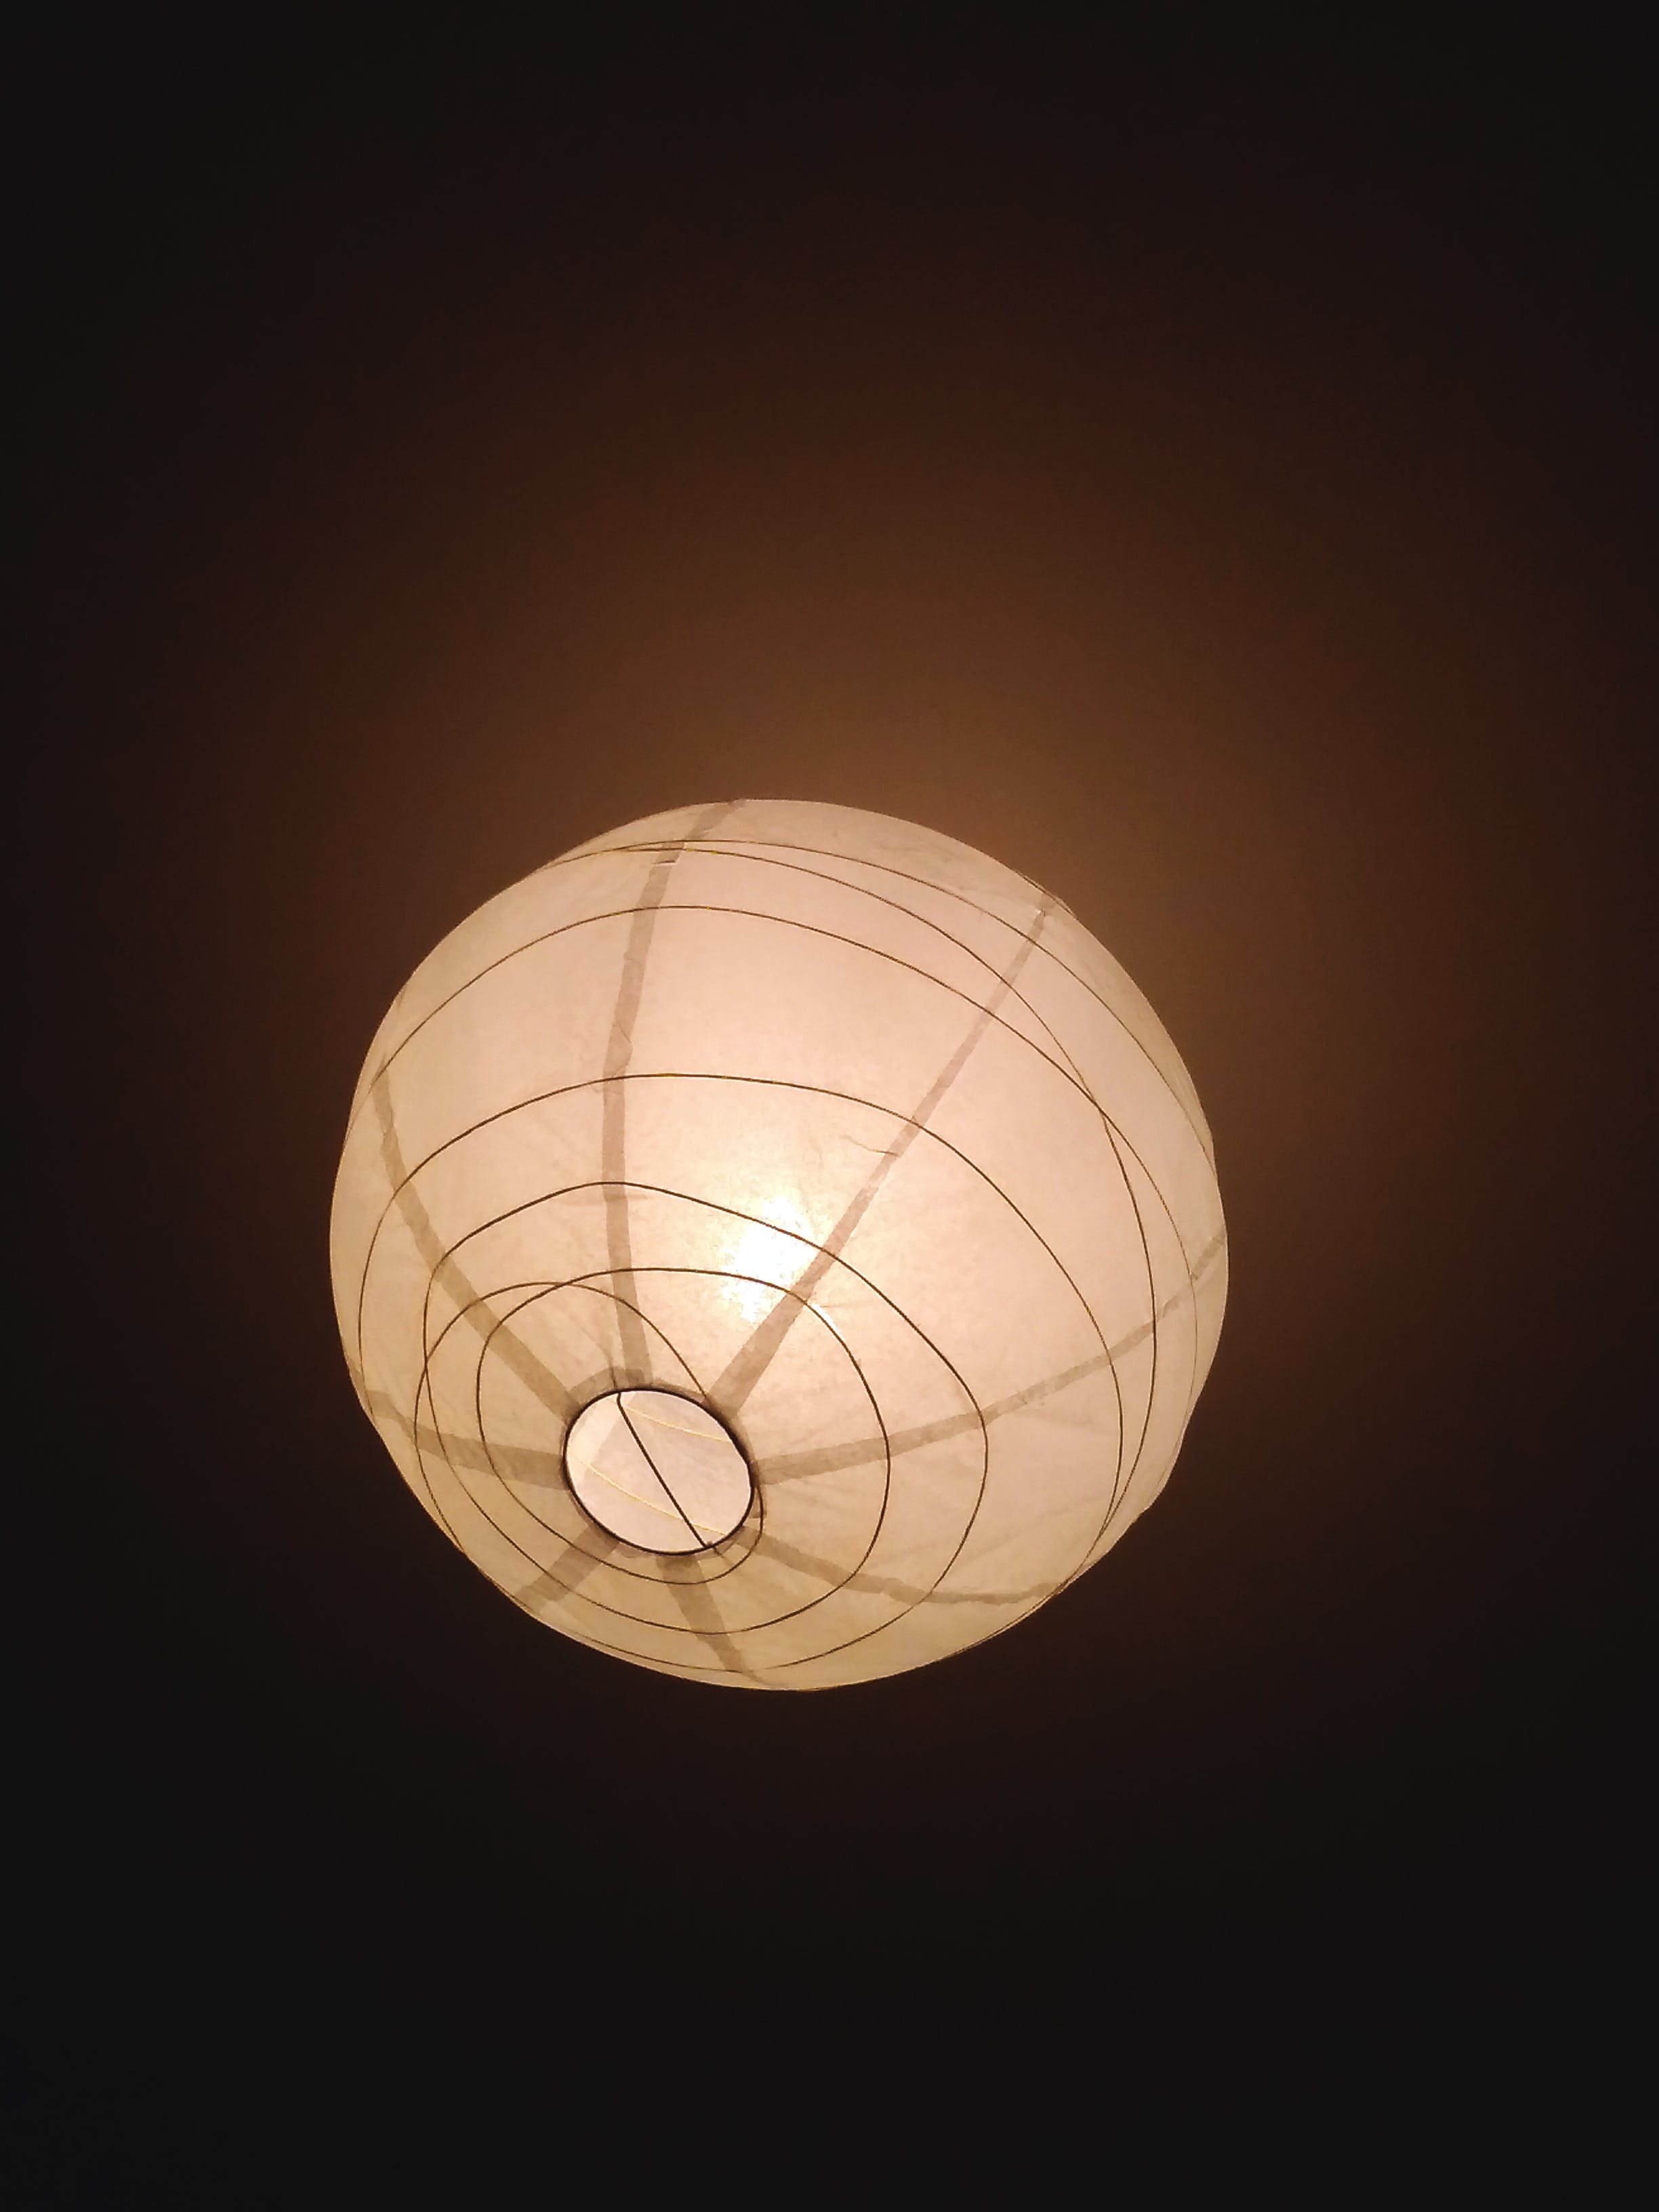 Free stock photo of art, bright, bulb, ceiling lamp